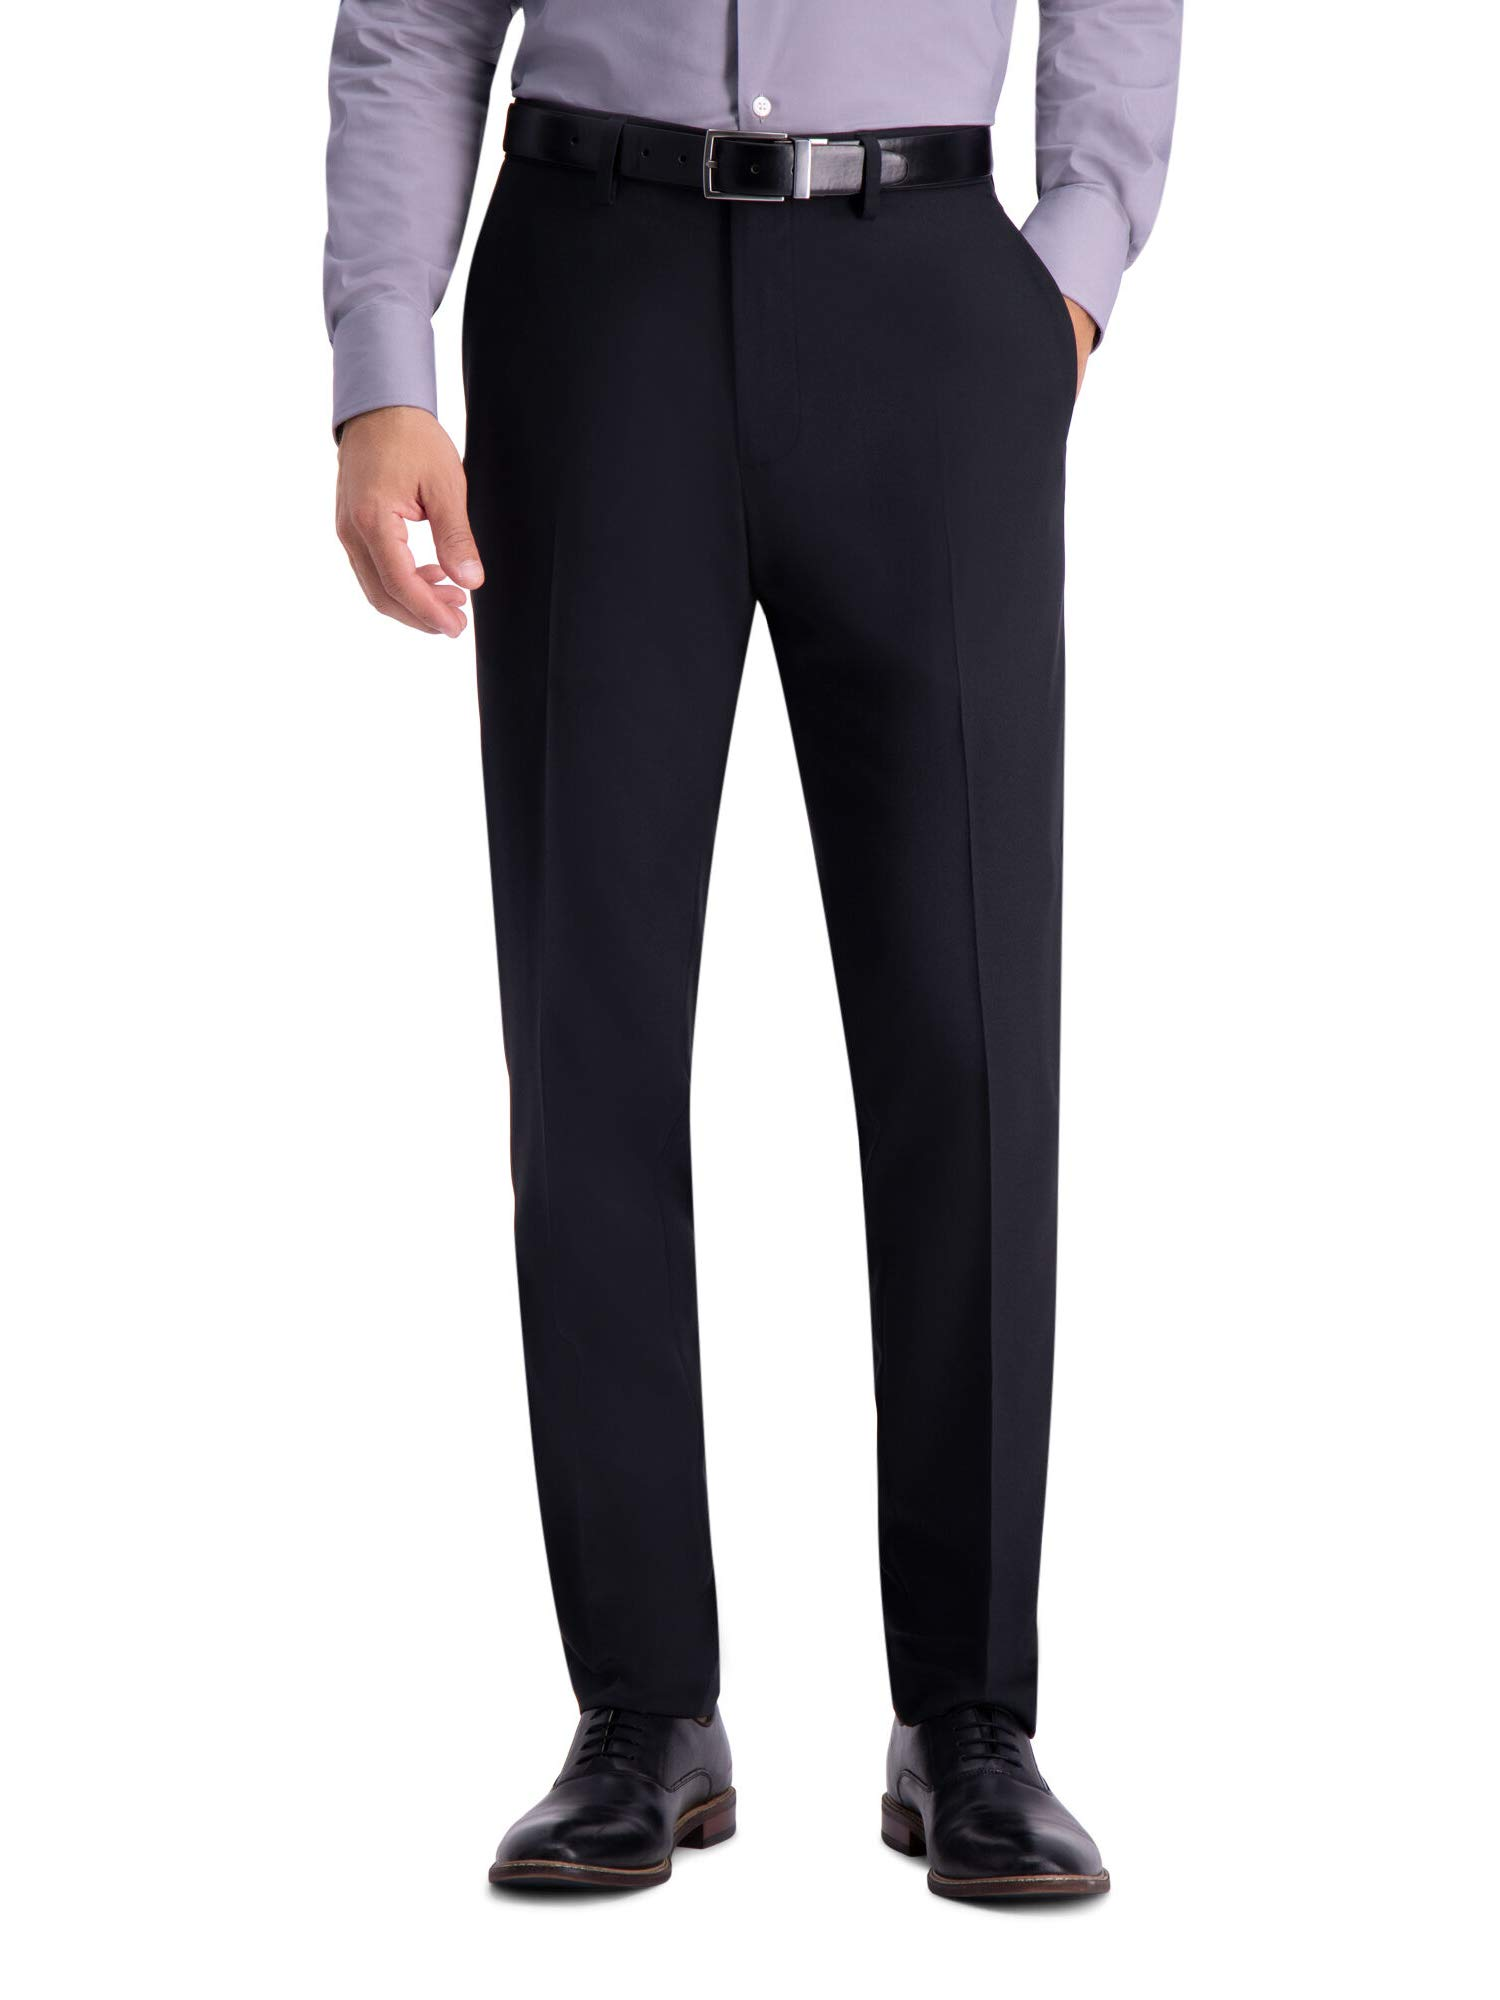 Haggar Men's Active Series Herringbone Suit Pant, Black - 34W x 29L by Haggar